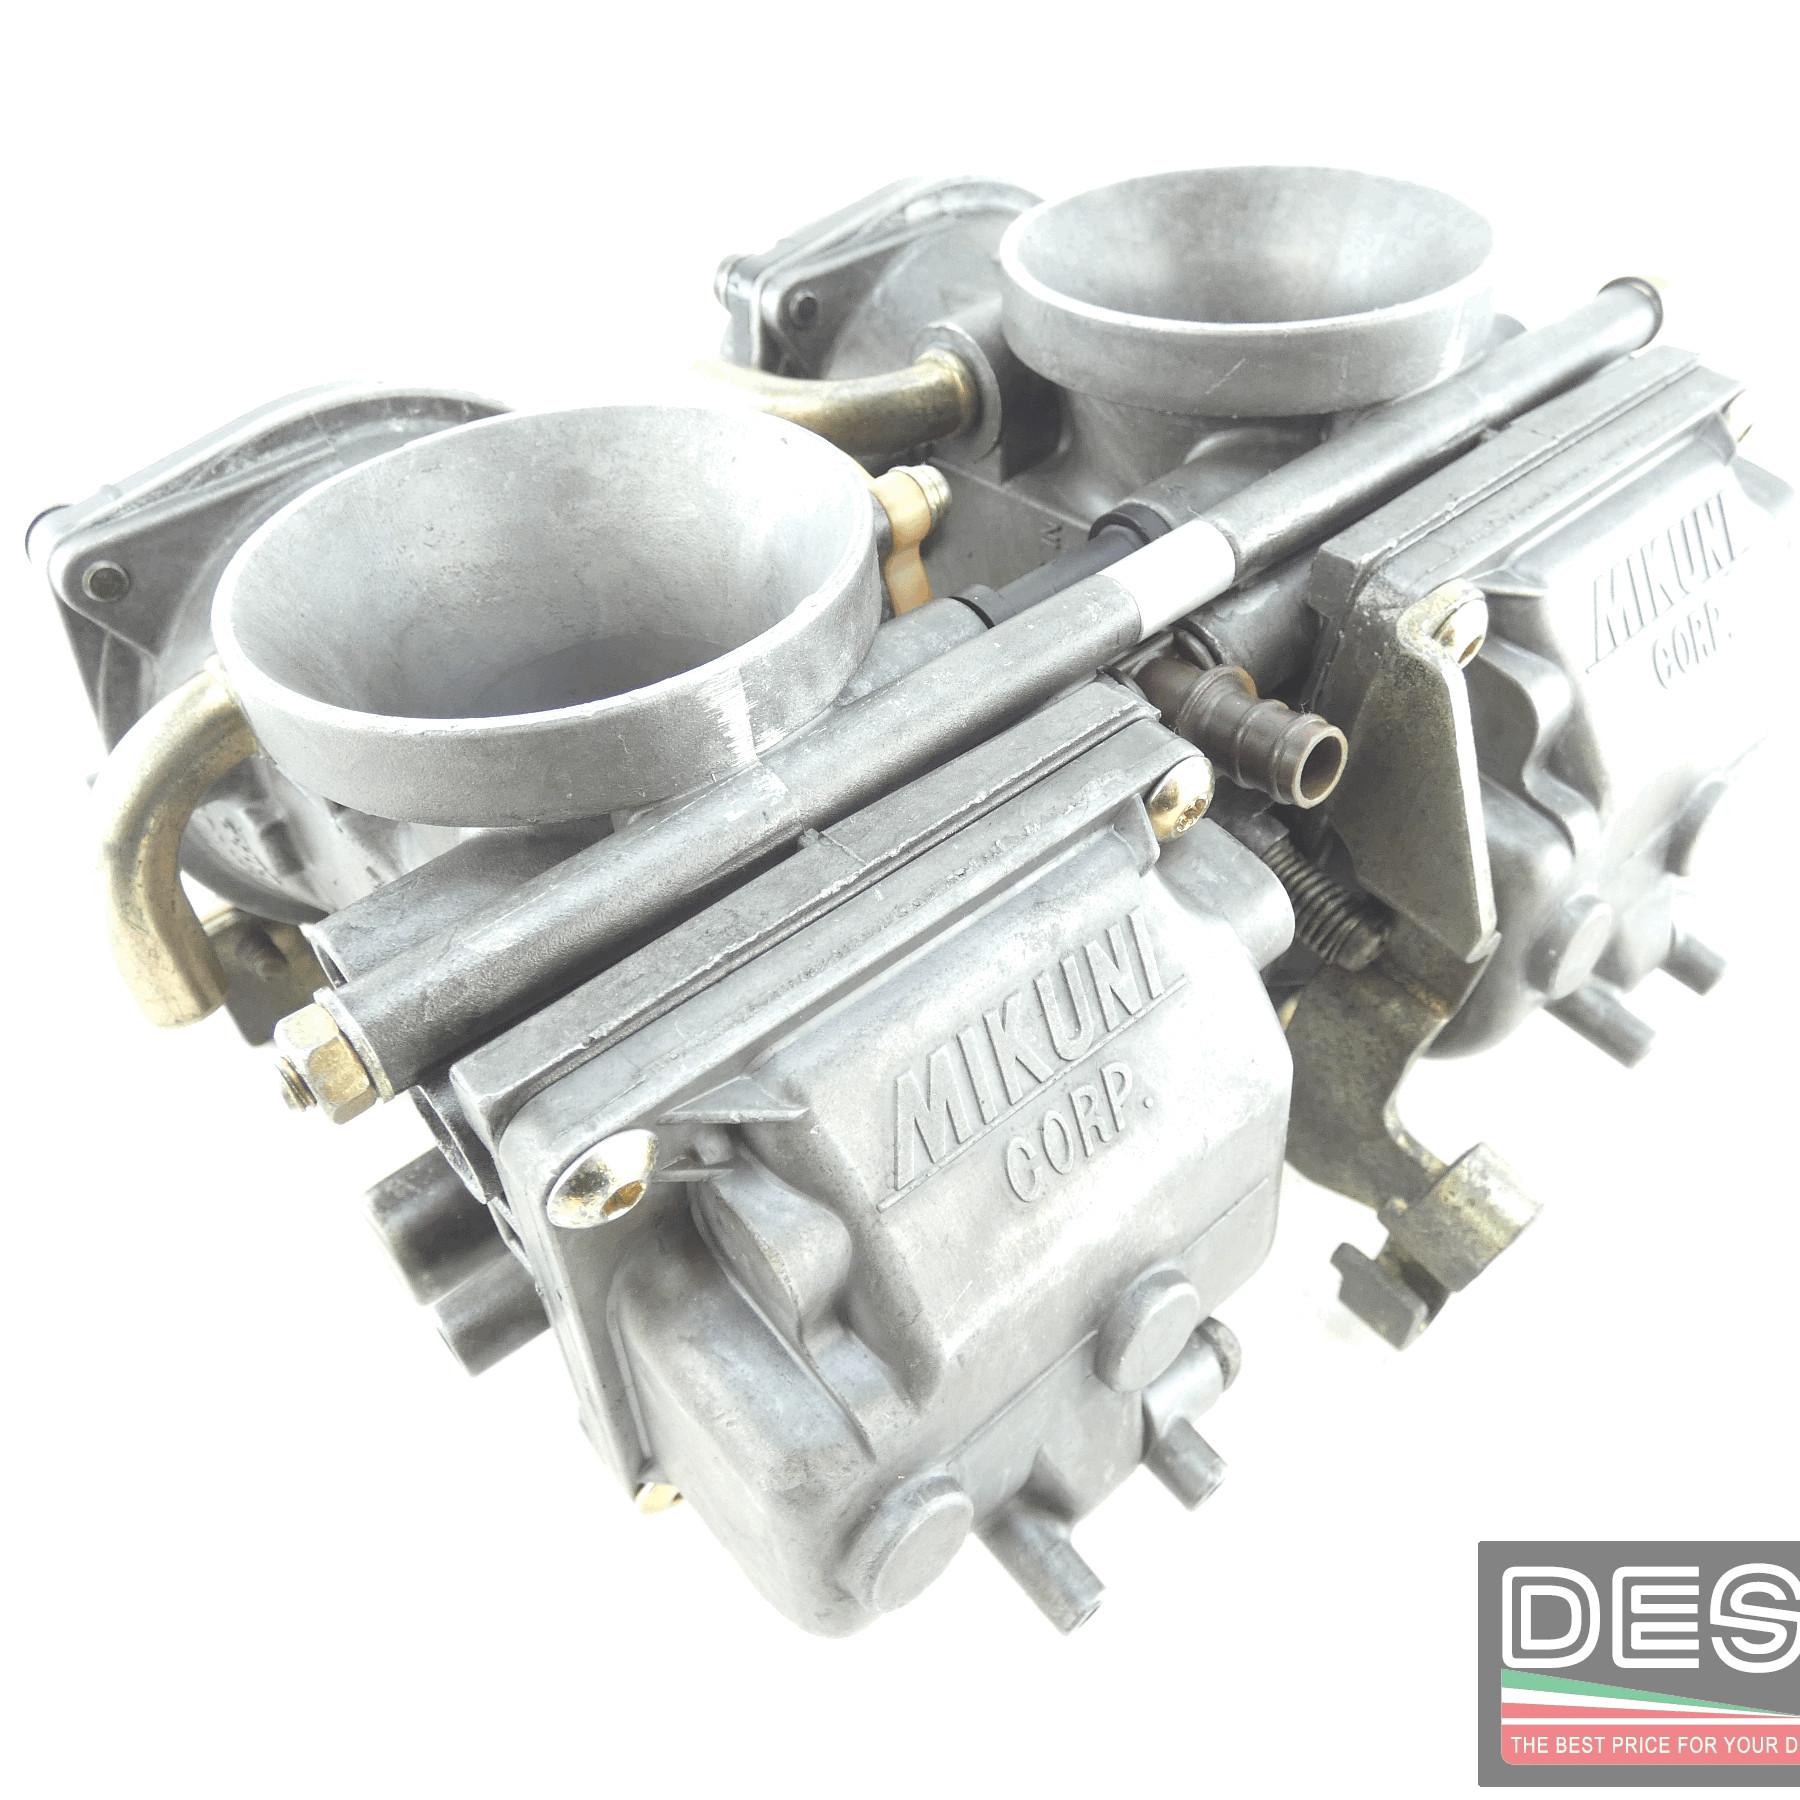 Carburatori mikuni ducati supersport 900